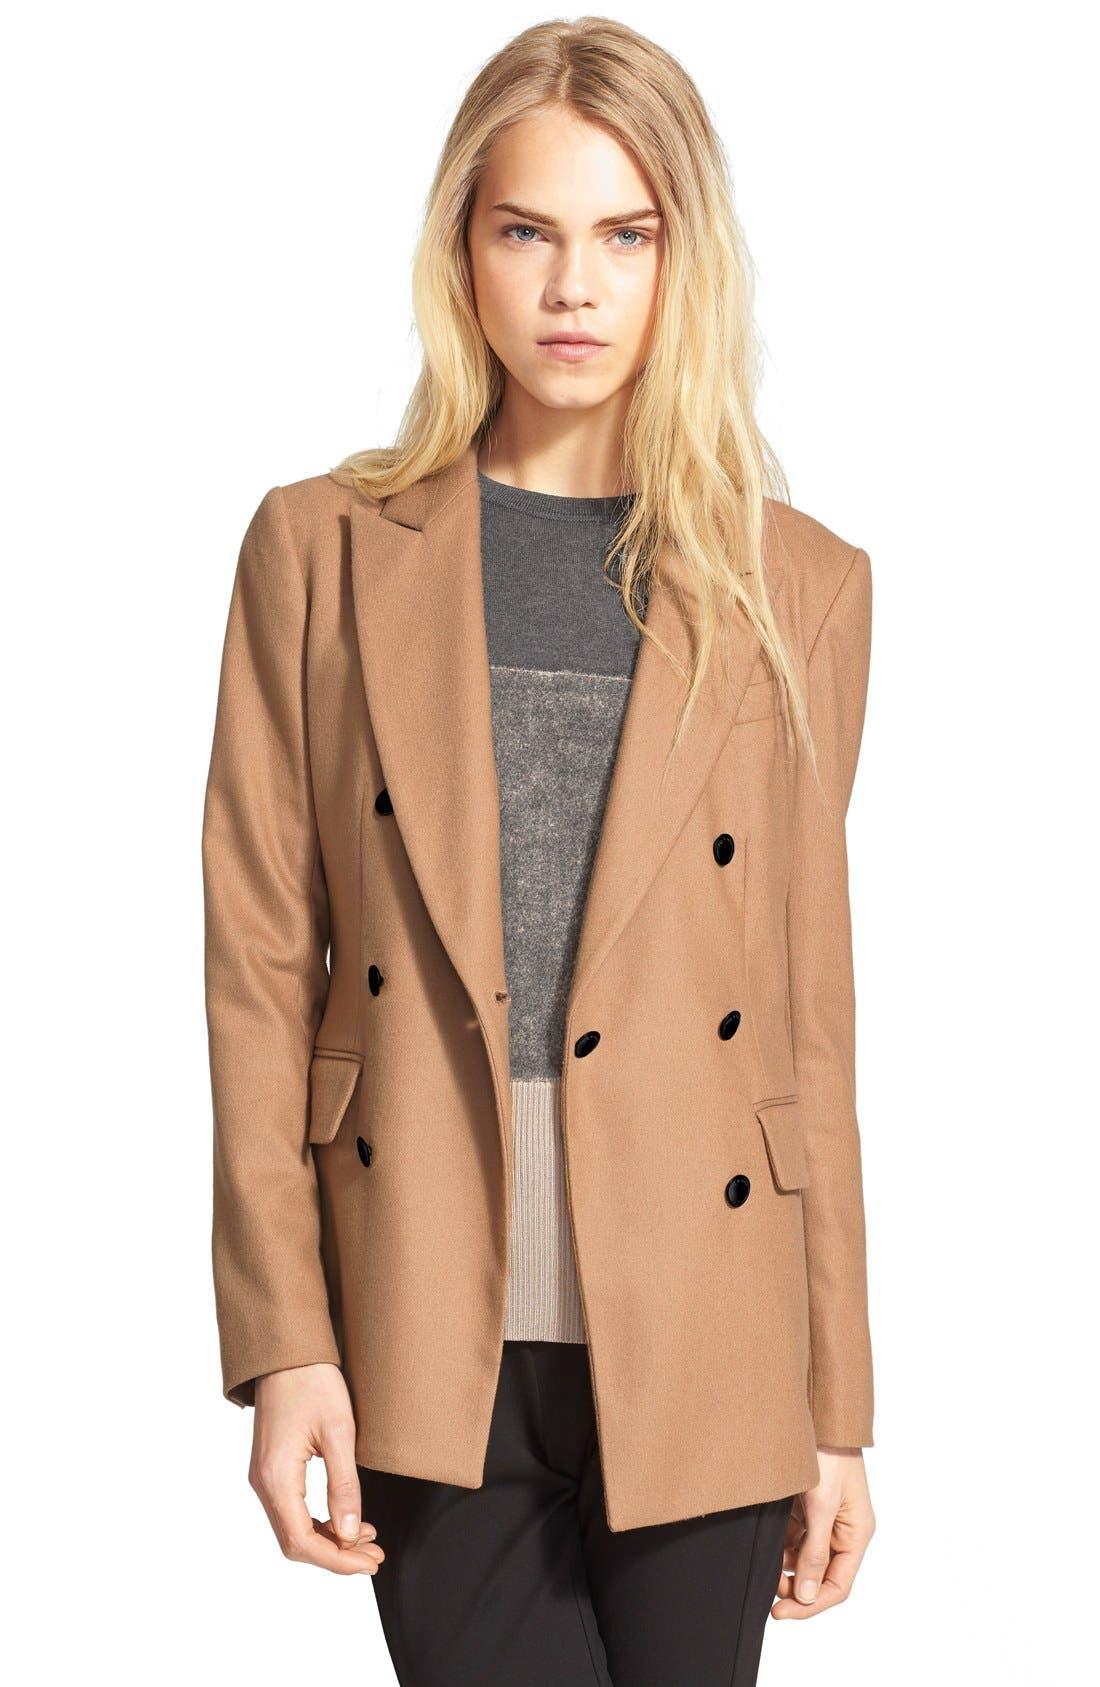 Main Image - rag & bone 'Corin' Wool Blend Blazer